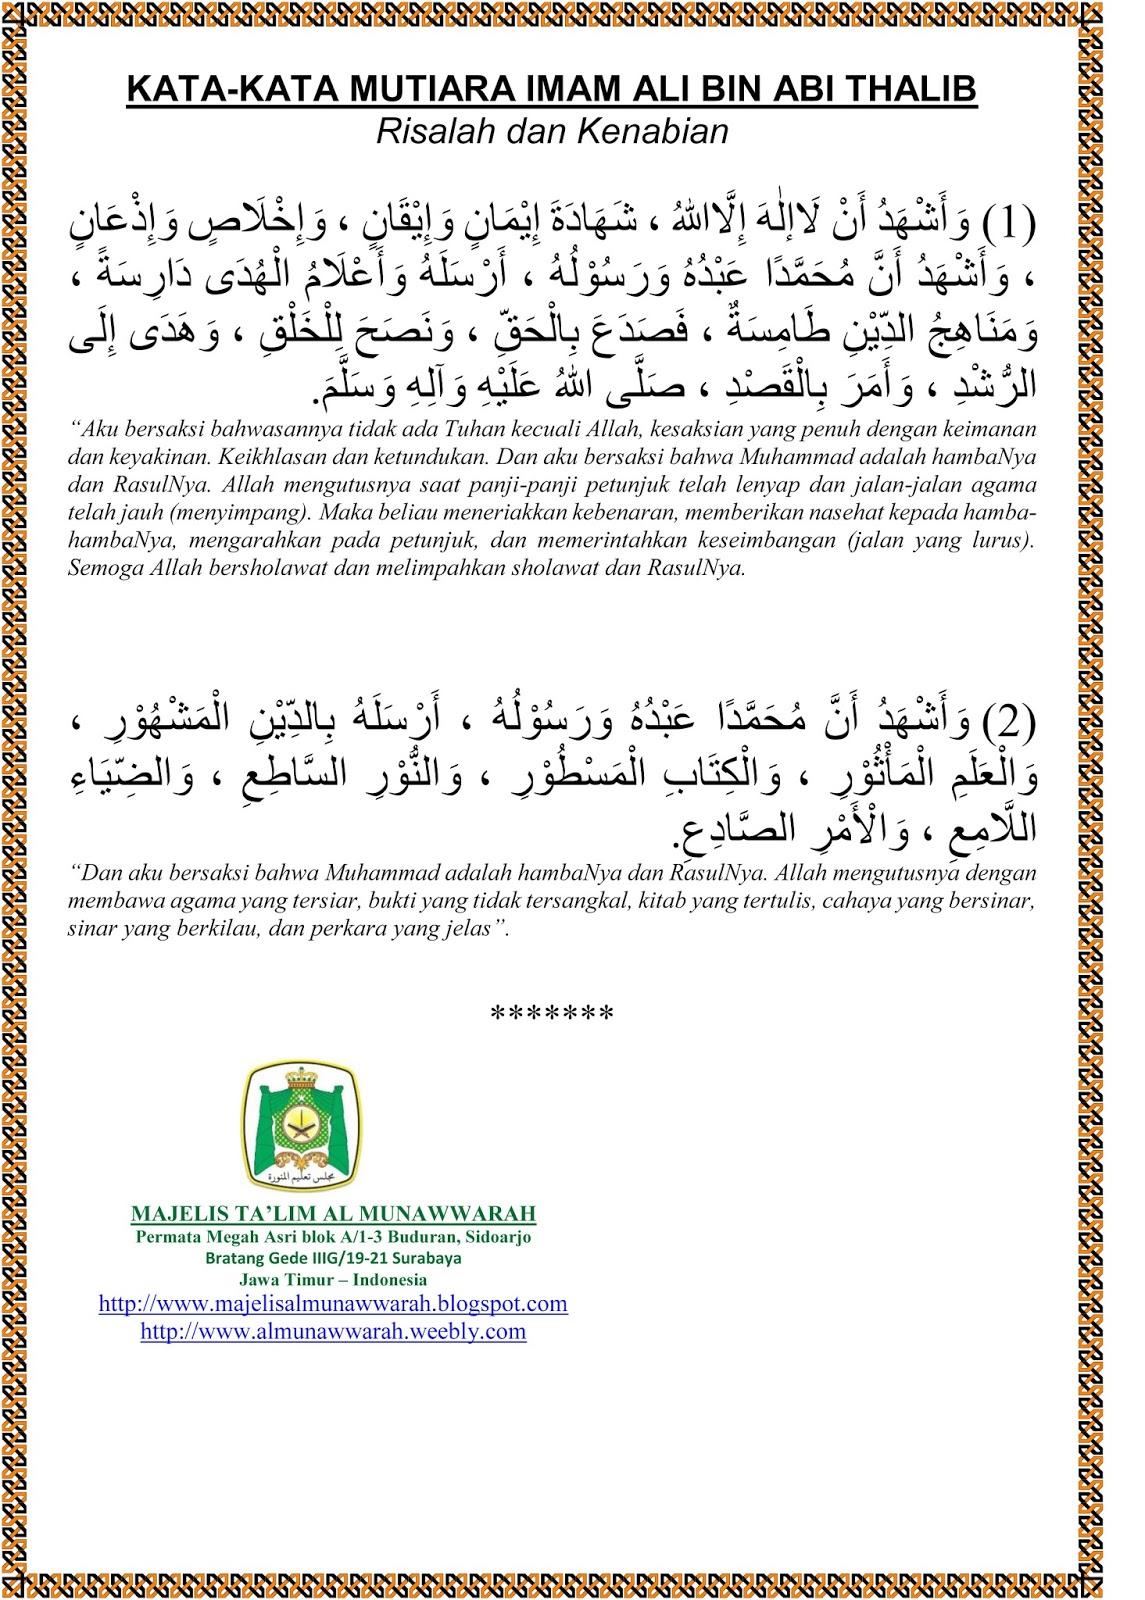 Risalah Dan Kenabian Kata Kata Mutiara Imam Ali Bin Abi Thalib Majelis Ta Lim Almunawwarah